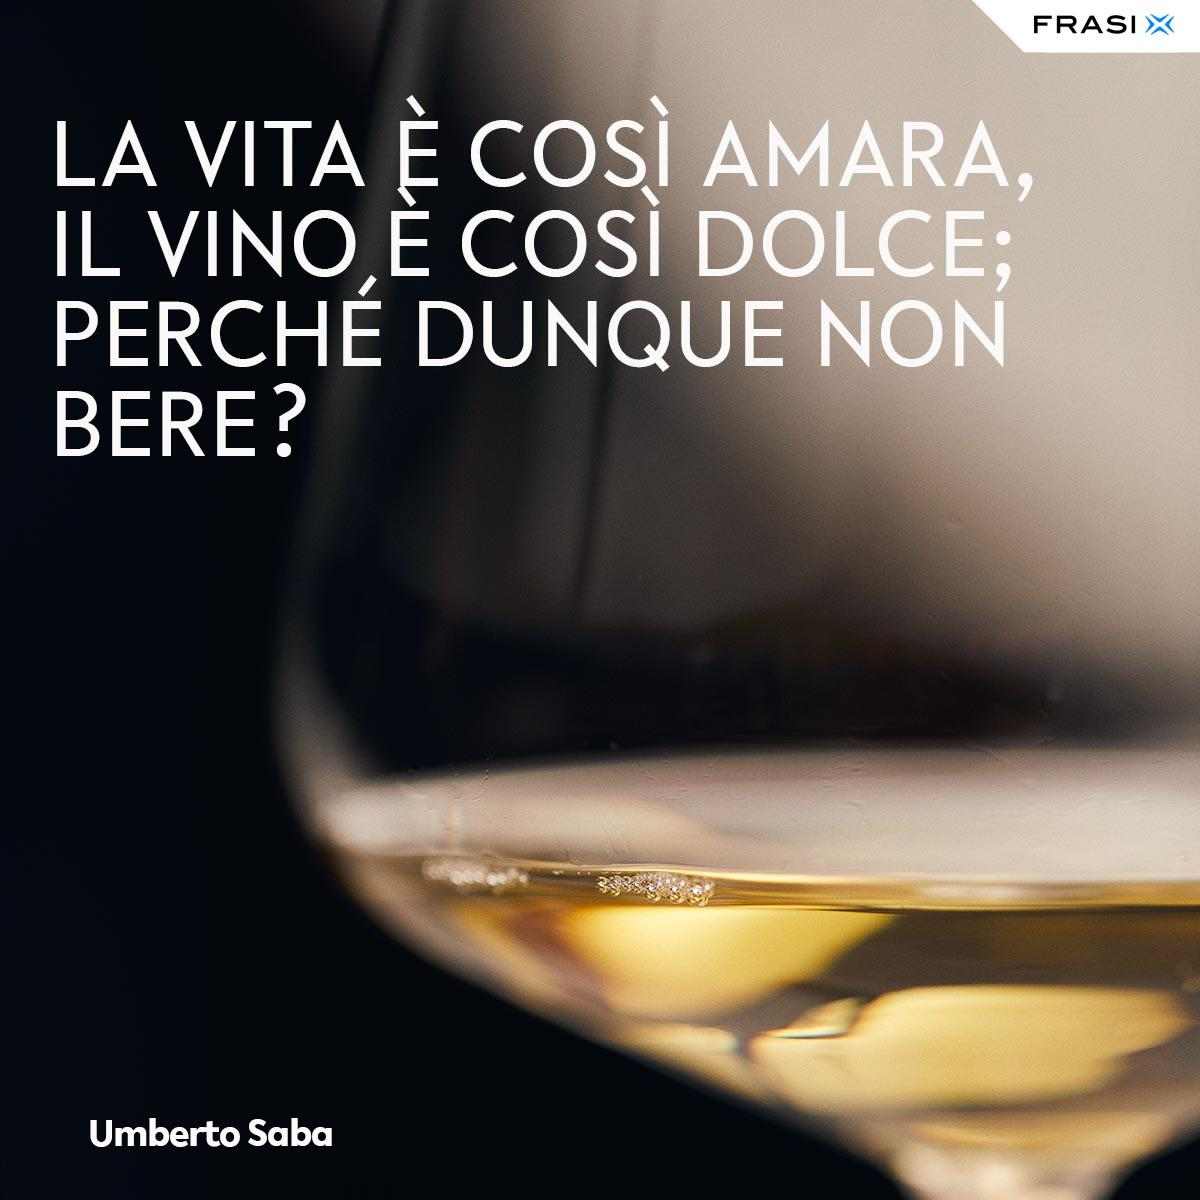 Frasi tumblr vita Umberto saba